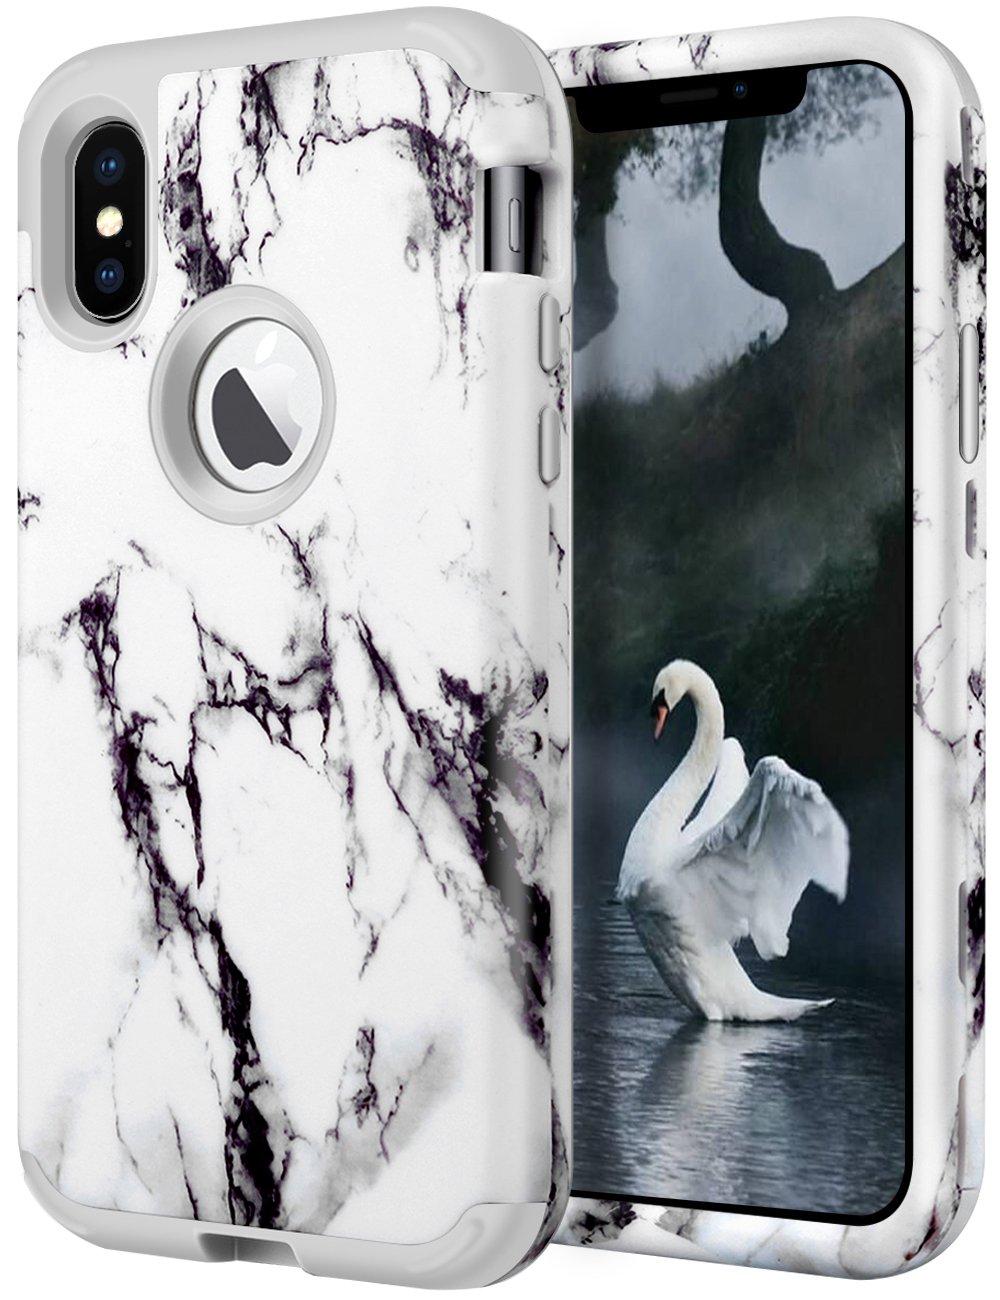 iPhone 6 / 6s財布型ケース、cheeringaryクレジットカード現金スロットIDホルダーカバーハイブリッドデュアルレイヤスリムソフトTPU耐衝撃とハードバンパー傷防止シェルfor Apple iPhone 6 / 6s ( 4.7インチ) iPhone X ホワイト B076KLBBDD iPhone X|iPhone X-6 White iPhone X-6 White iPhone X